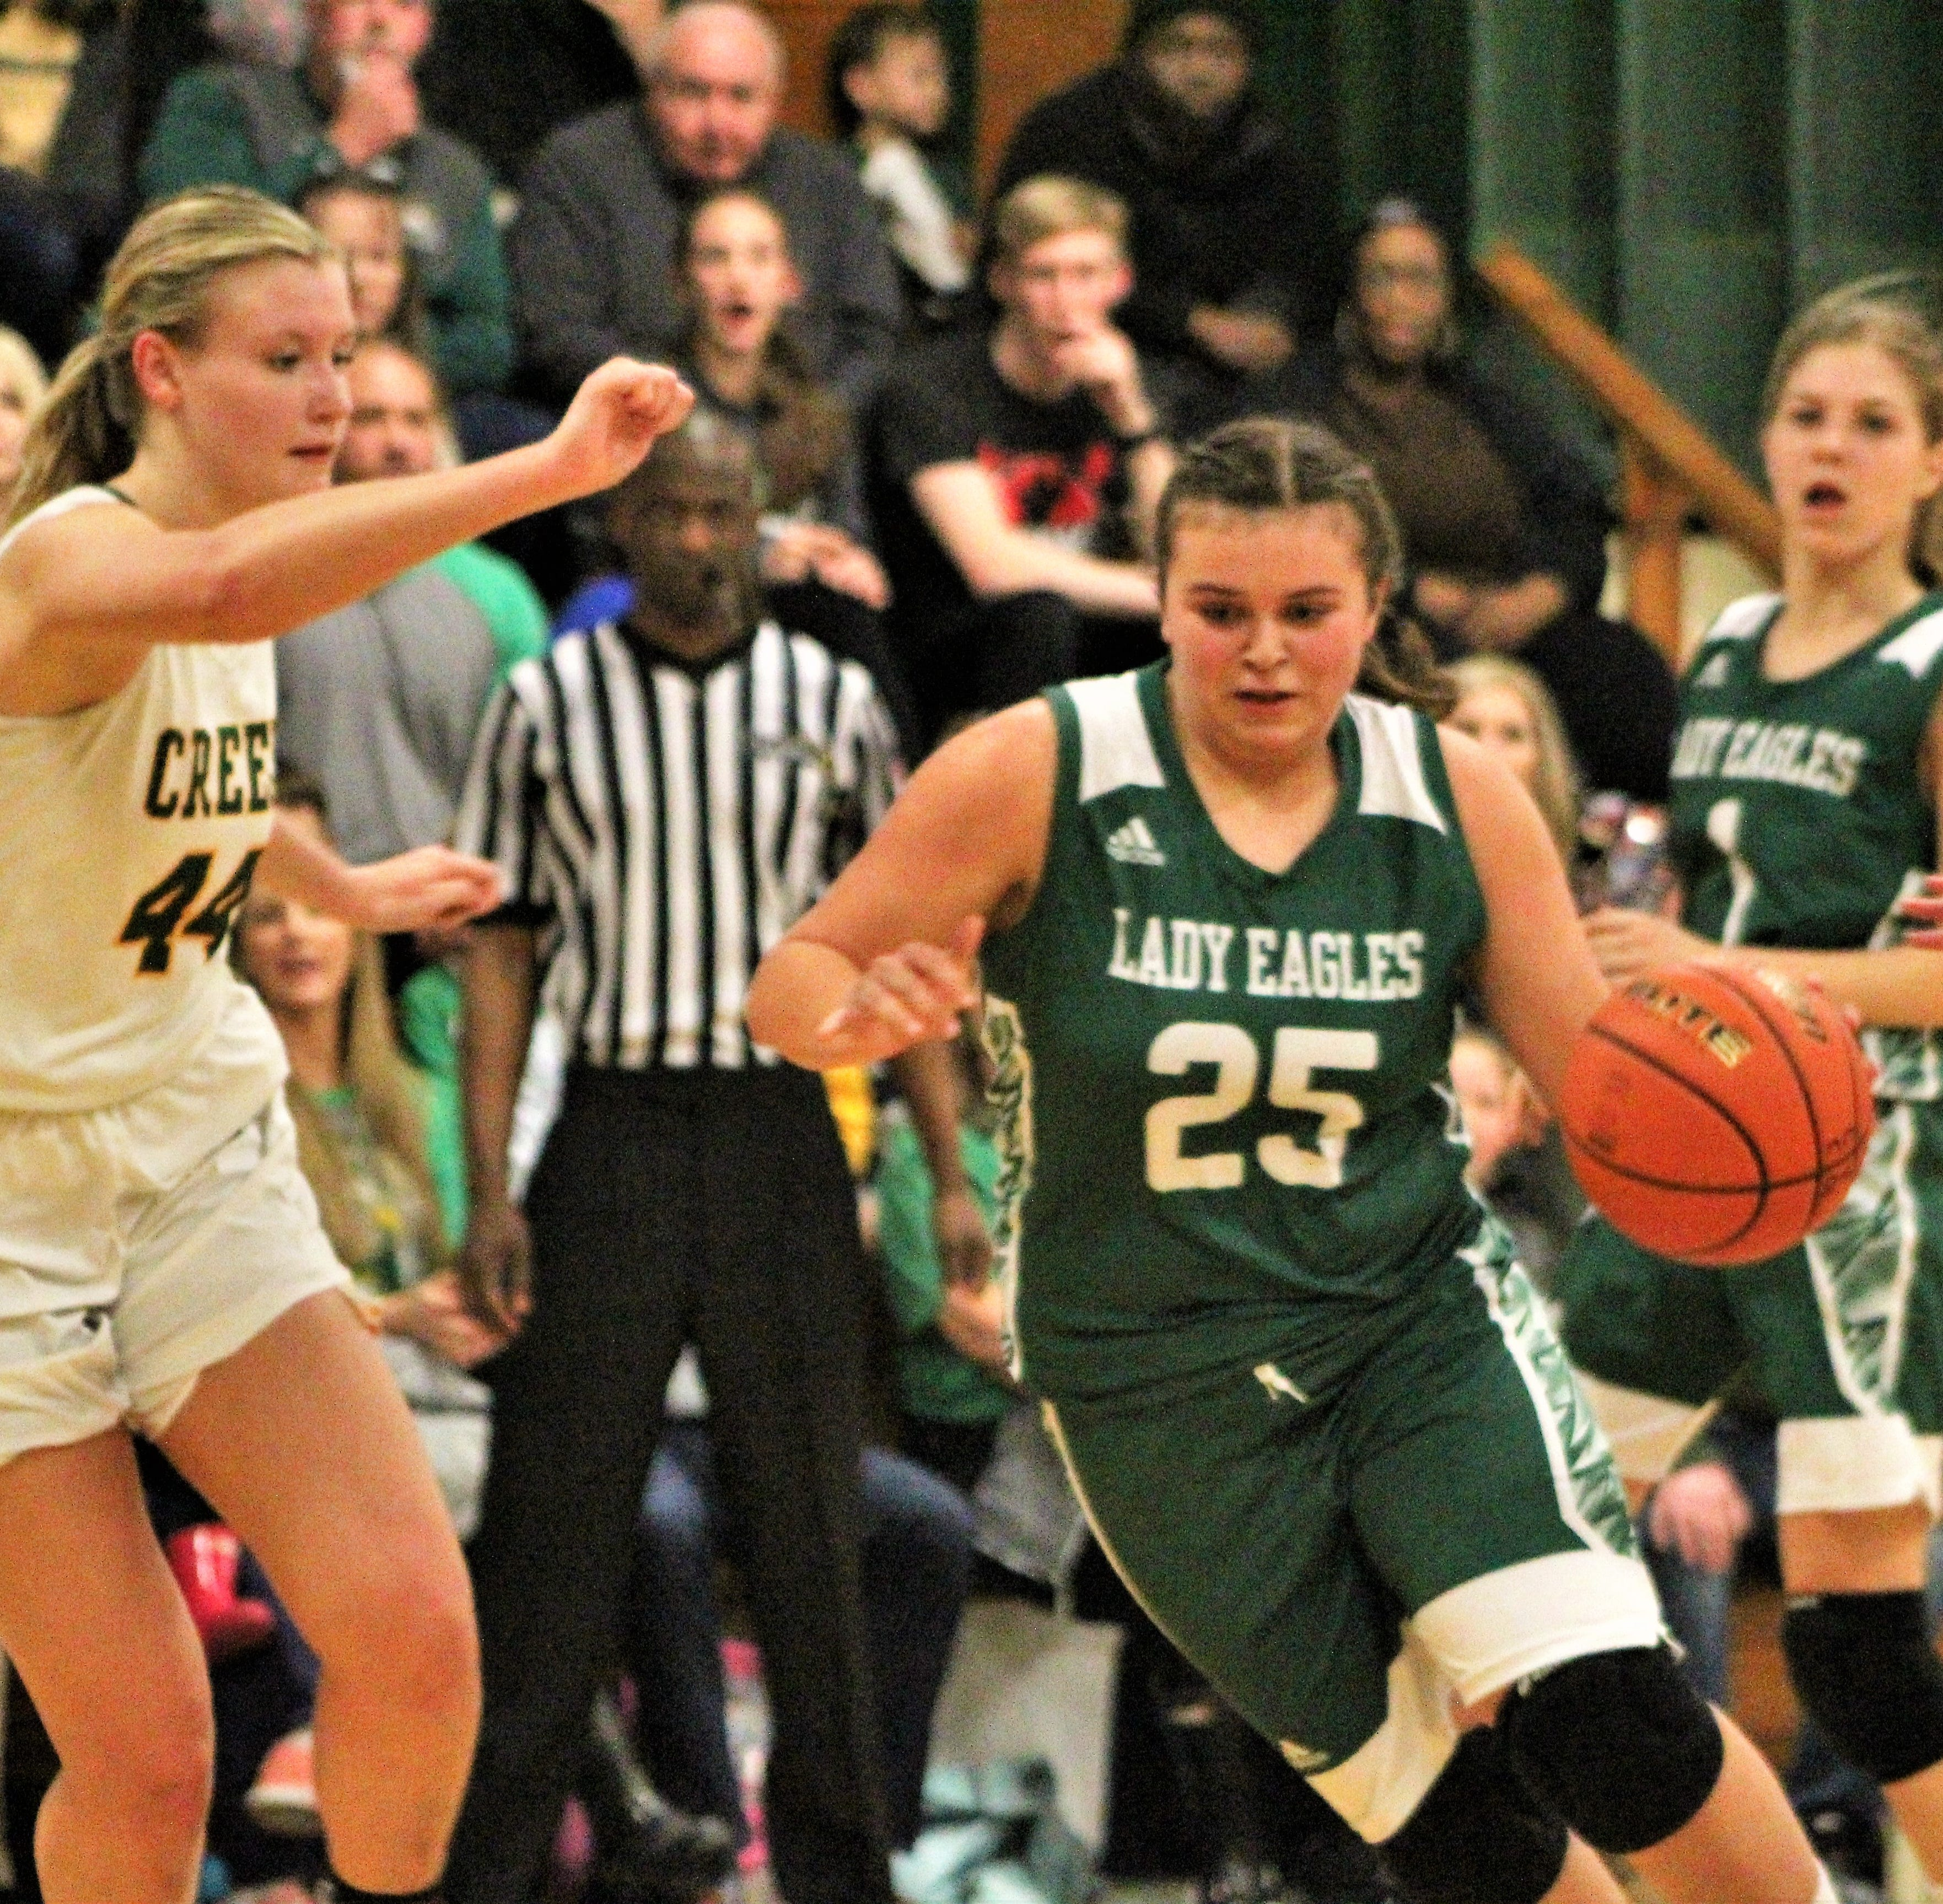 OCS's Madison Basco (25) dribbles the ball past Cedar Creek's Anna Larr Roberson (44) in OCS's 48-43 victory on the LHSAA Division IV quarterfinals at Cedar Creek's The Brickhouse on Thursday night.